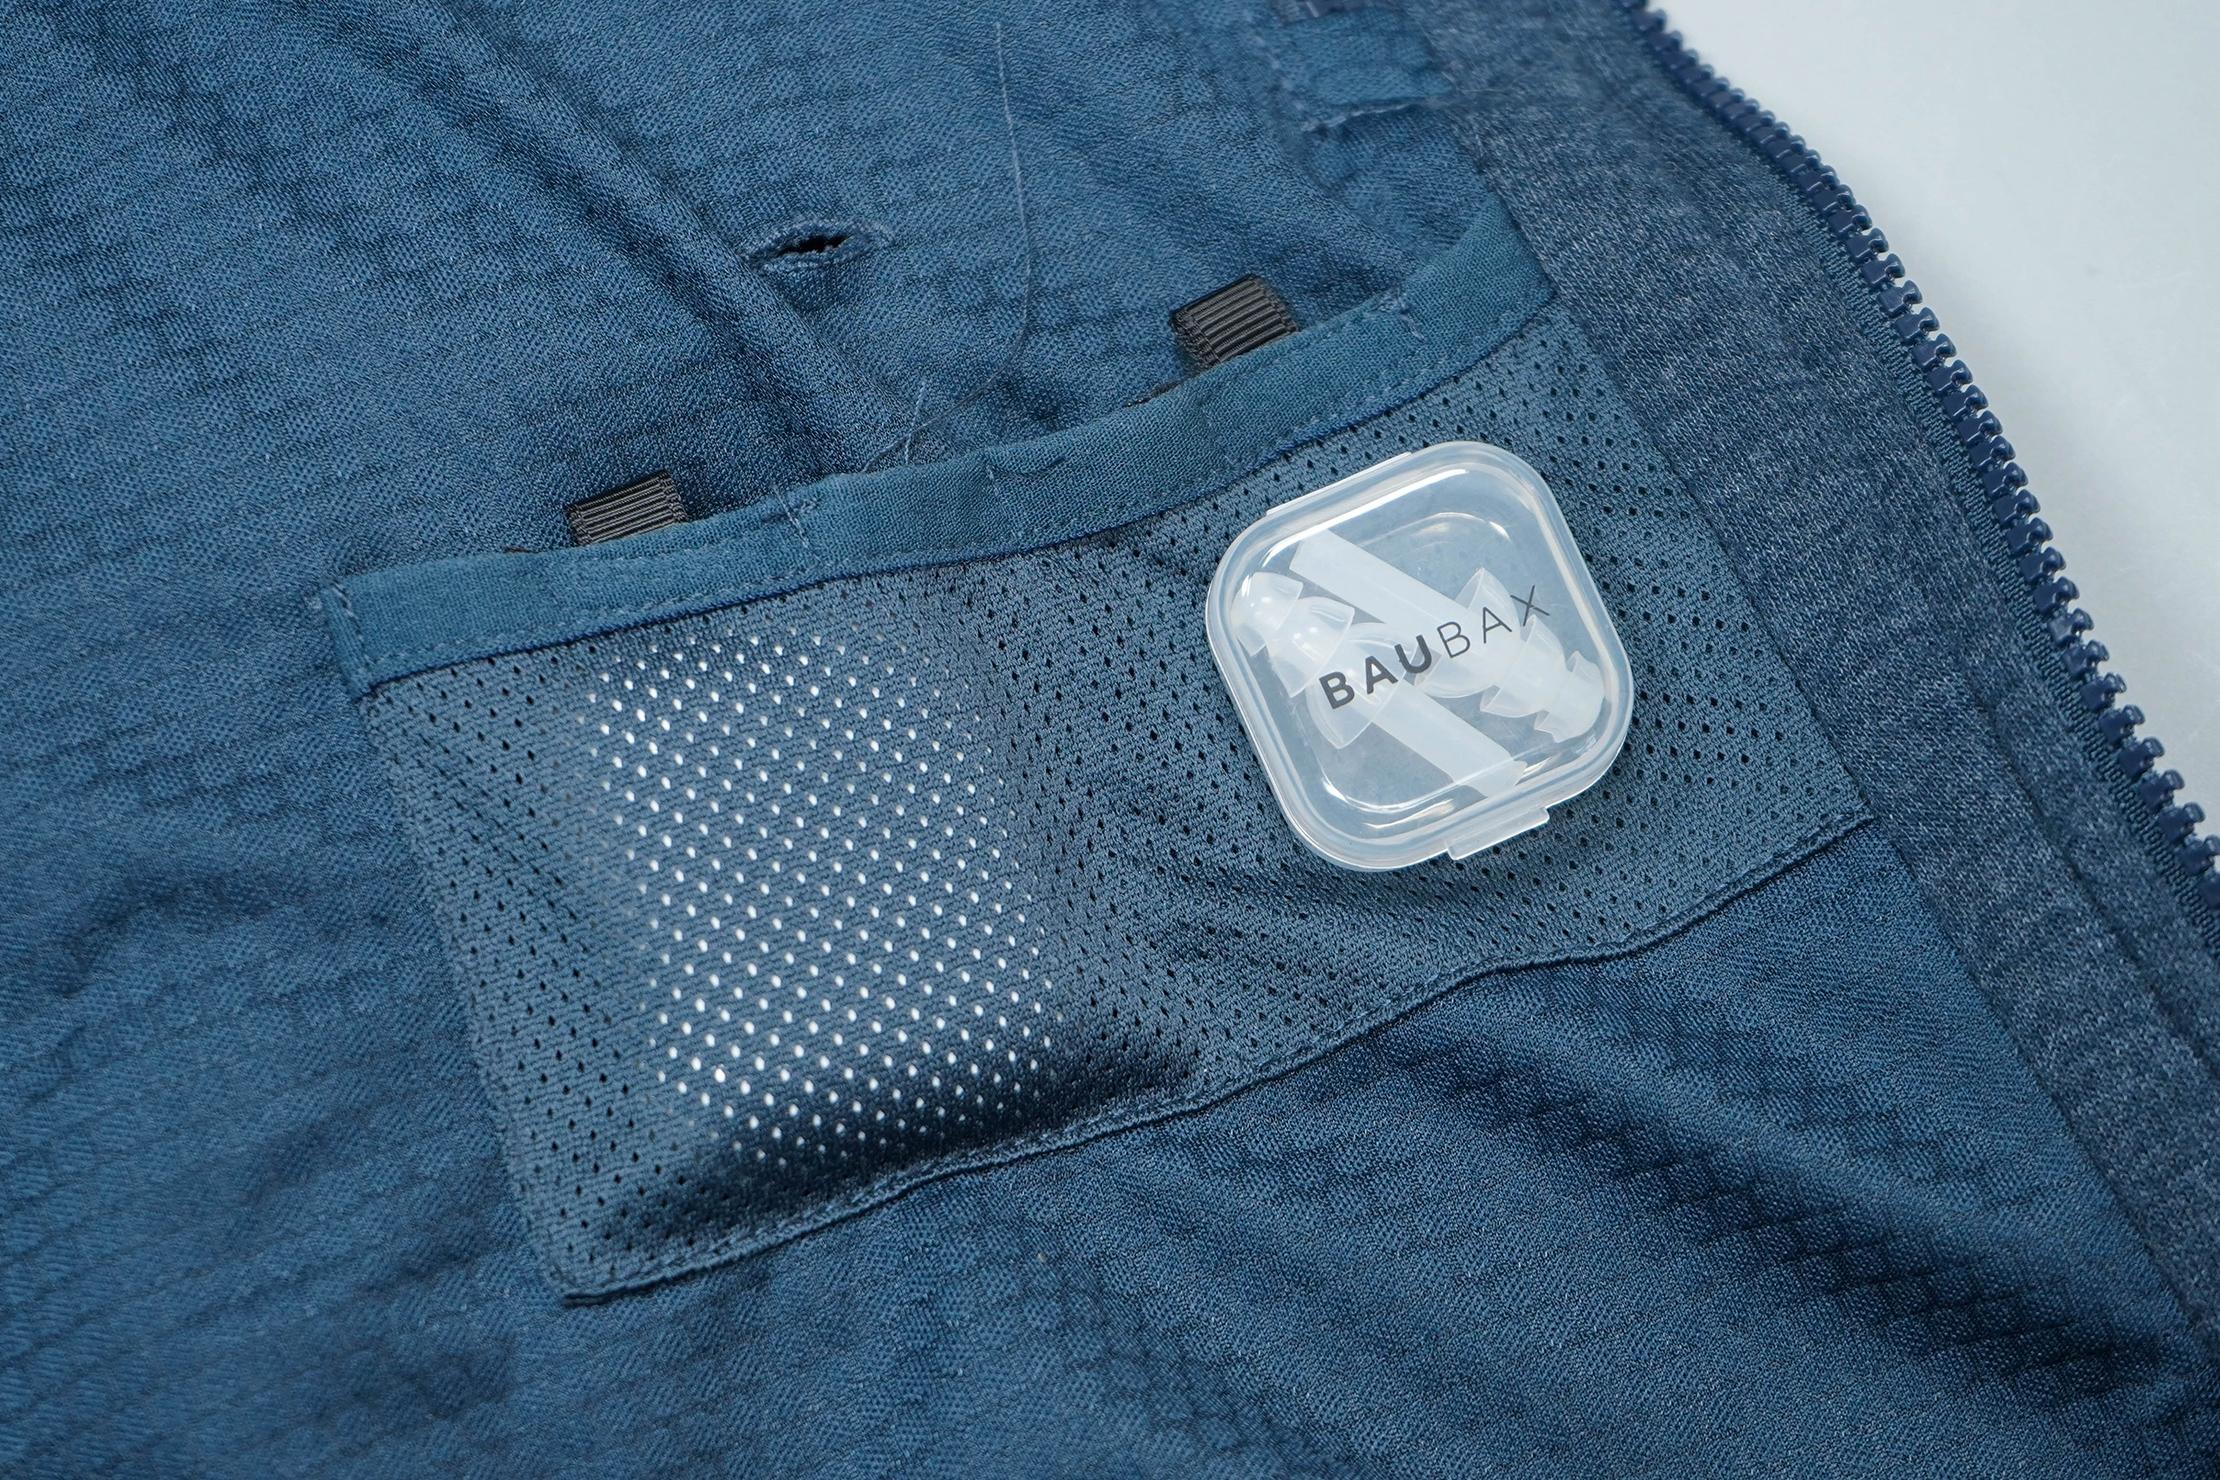 BauBax Sweatshirt 2.0 Earplugs And AirPods